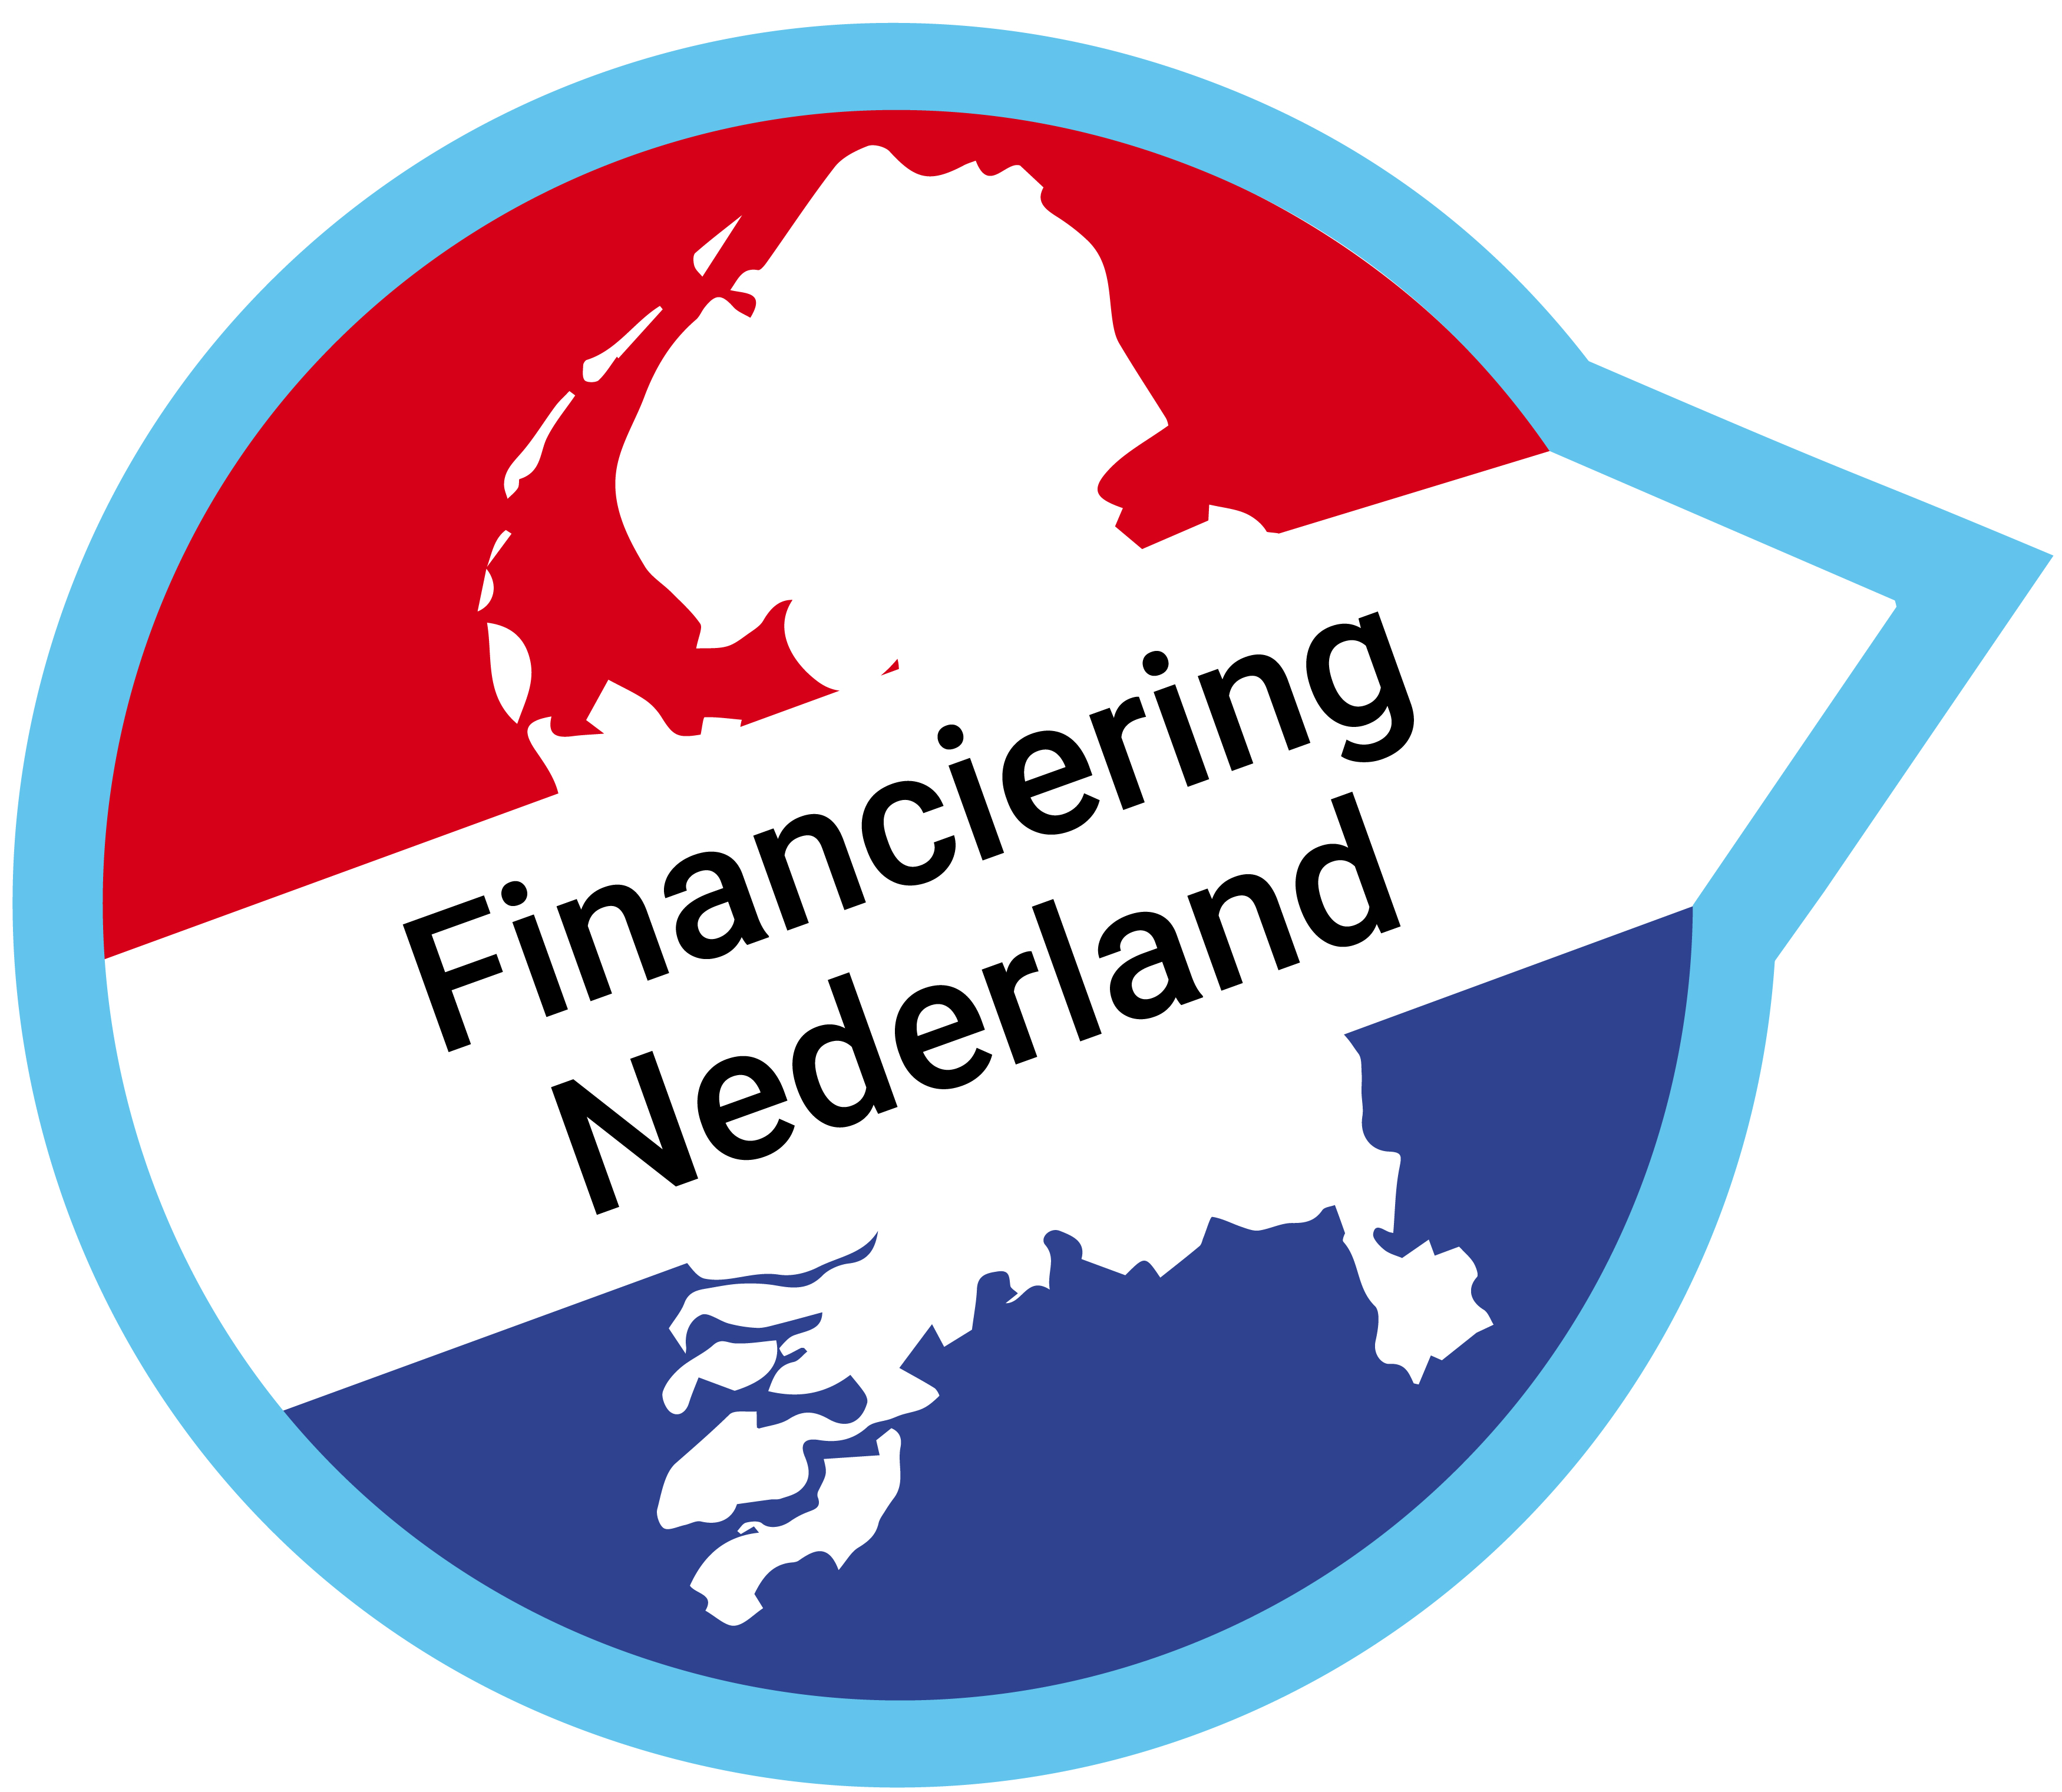 Financiering Nederland